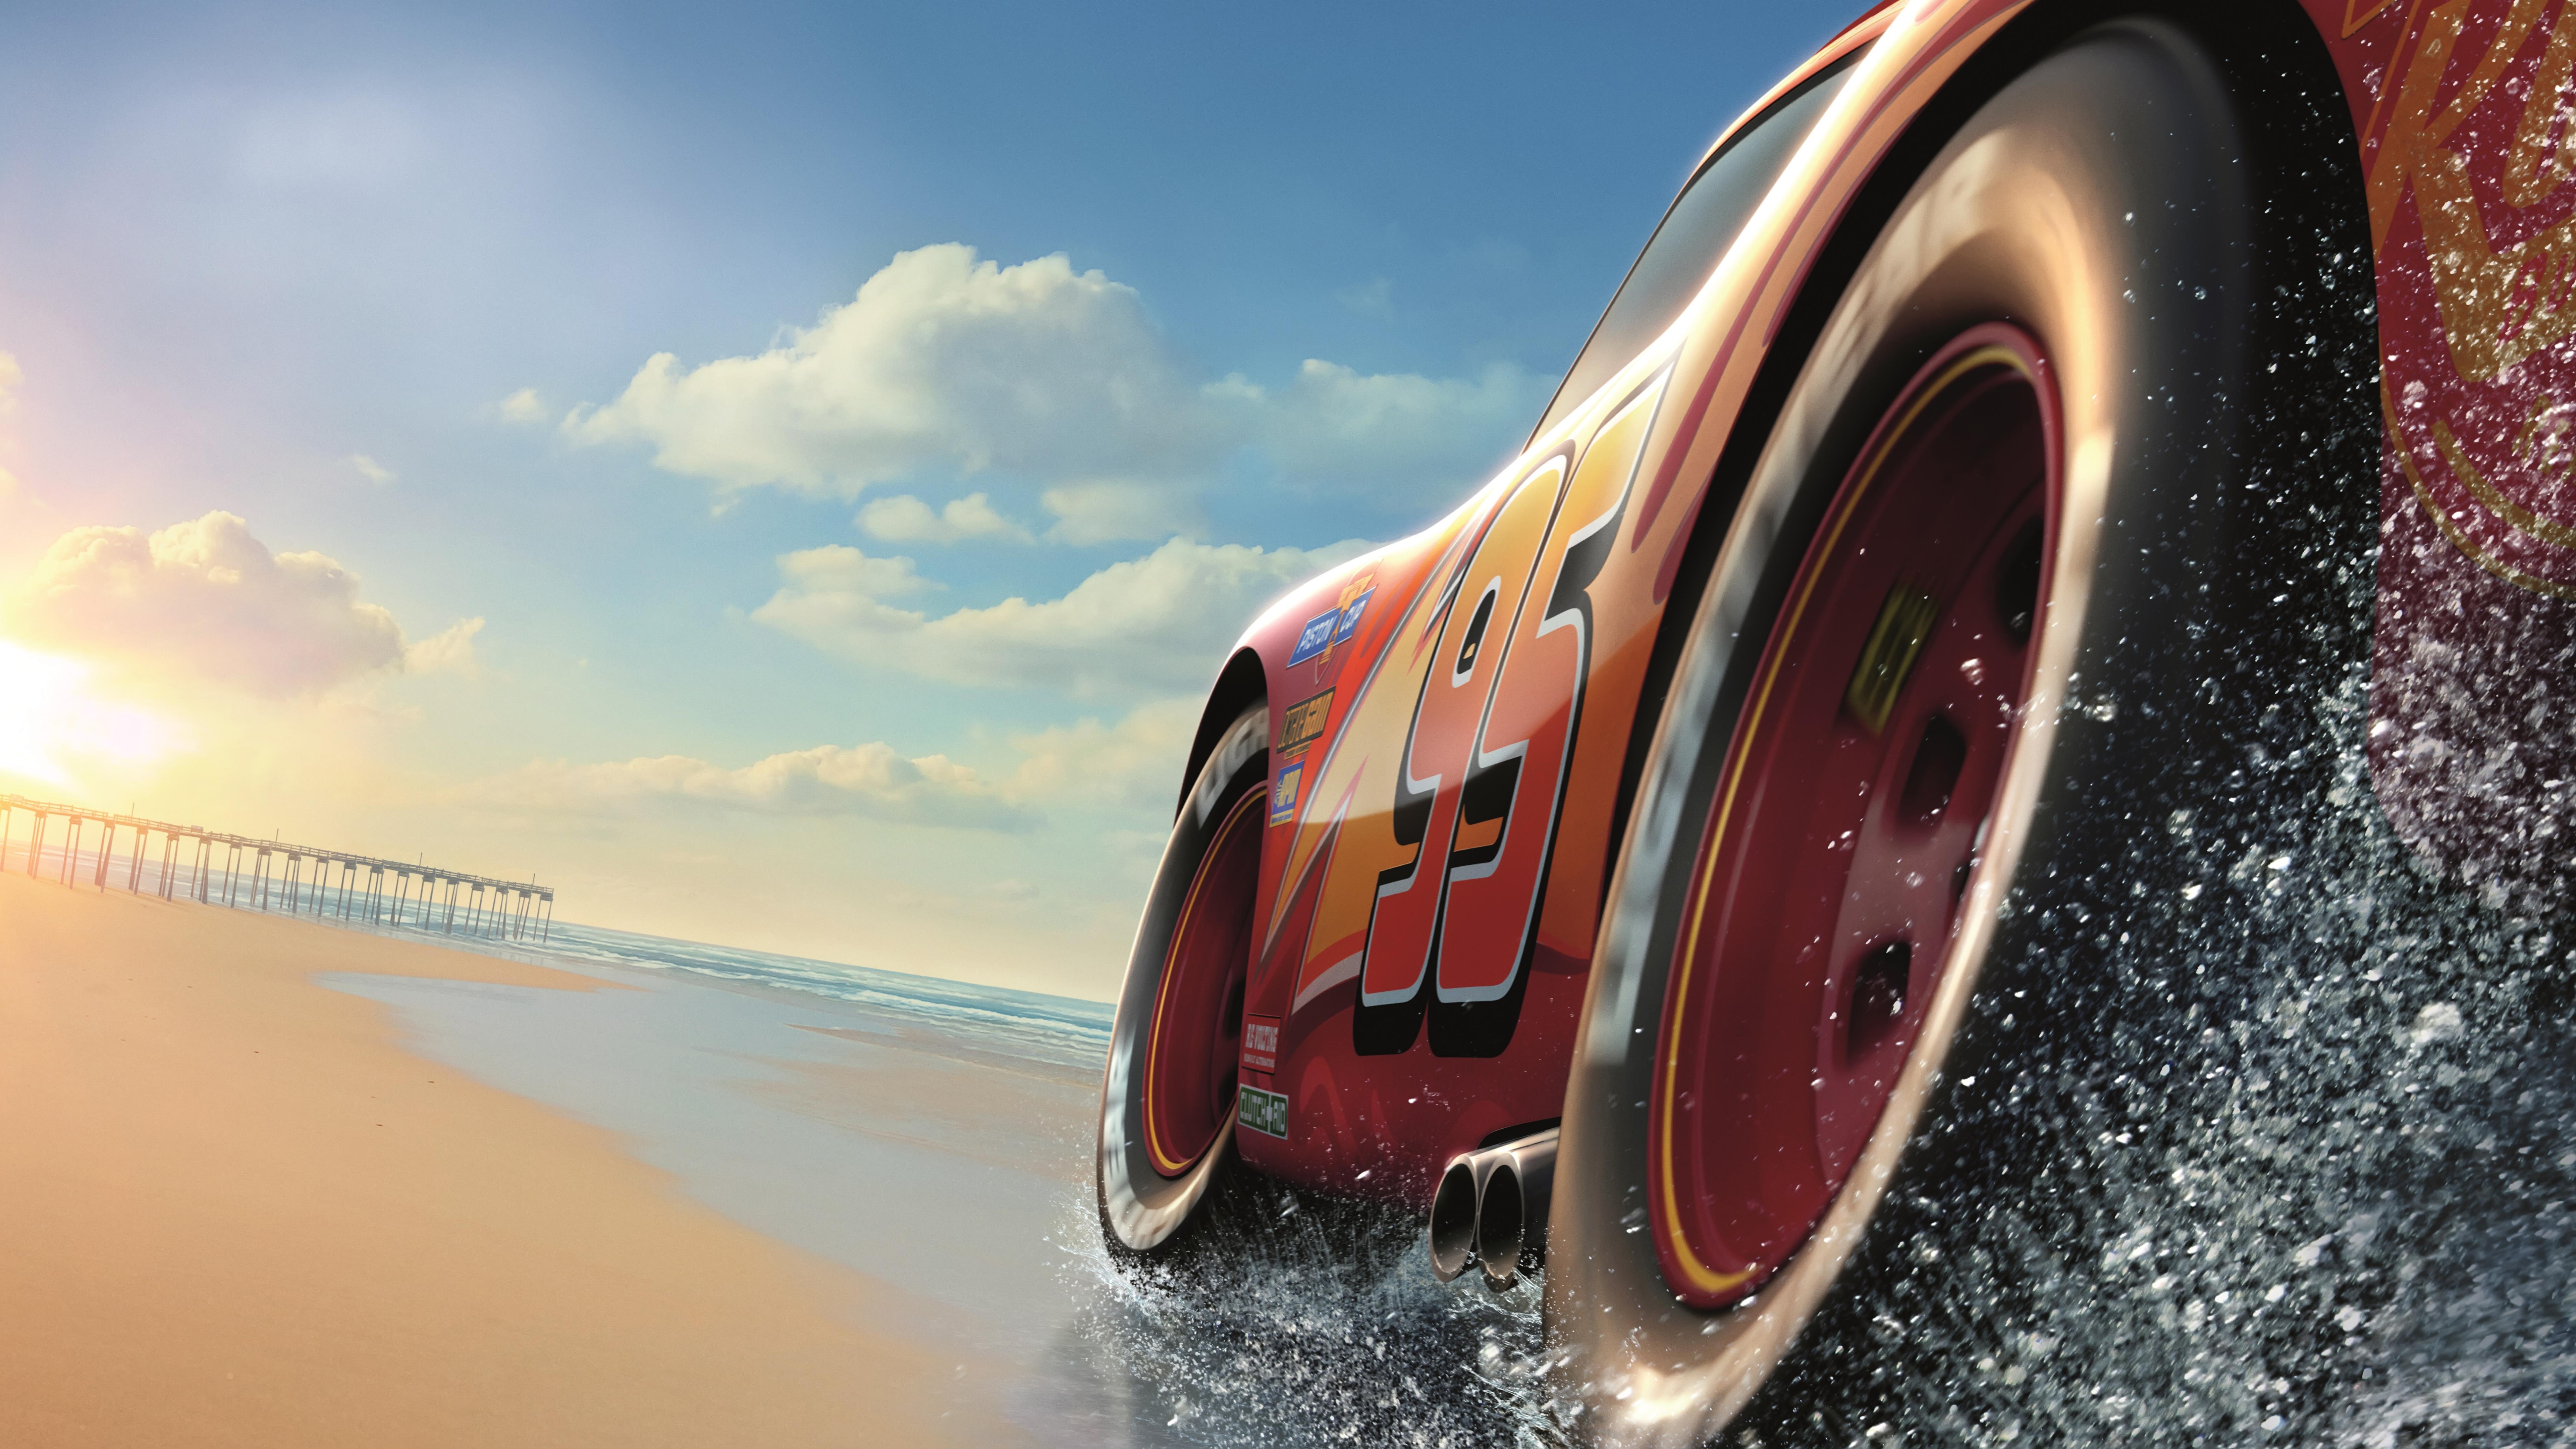 7680x4320 Cars 3 8k Disney Movie 8k Hd 4k Wallpapers Images